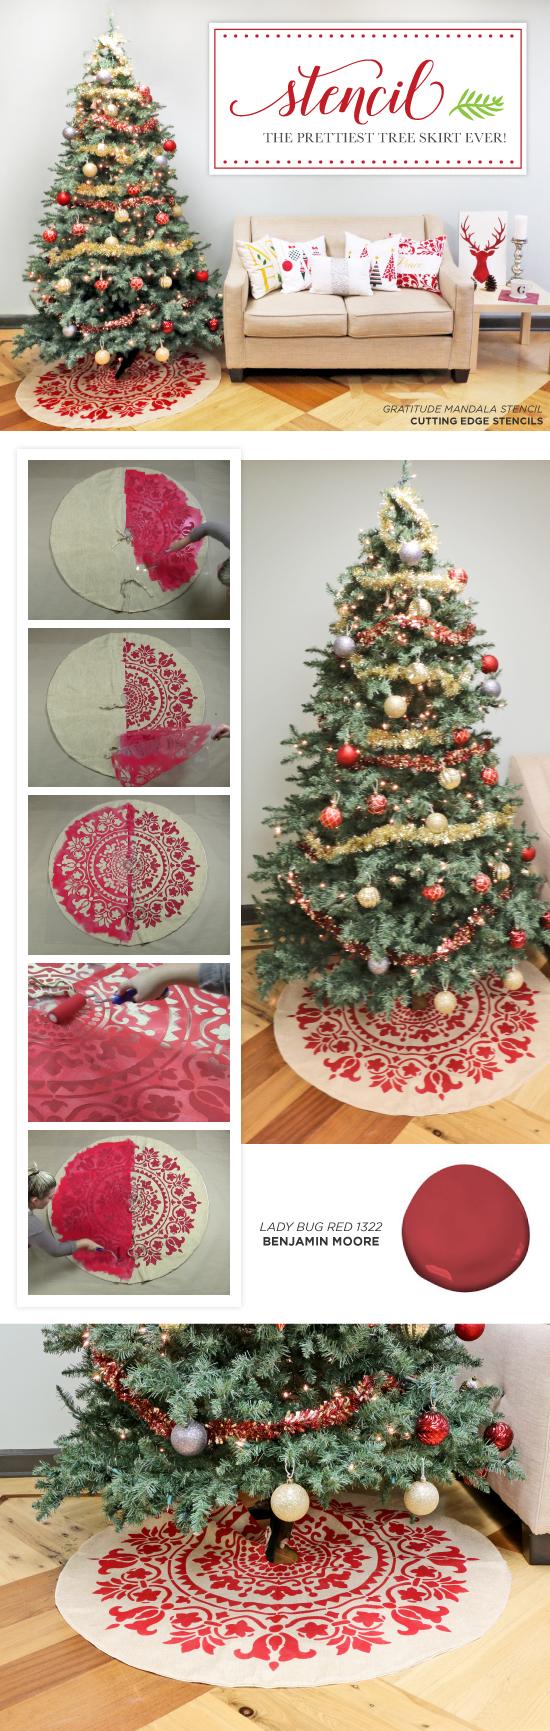 Cutting Edge Stencils shares how to stencil the prettiest DIY Christmas Tree Skirt using the Gratitude Mandala Stencil. http://www.cuttingedgestencils.com/prosperity-mandala-stencil-yoga-mandala-stencils-designs.html